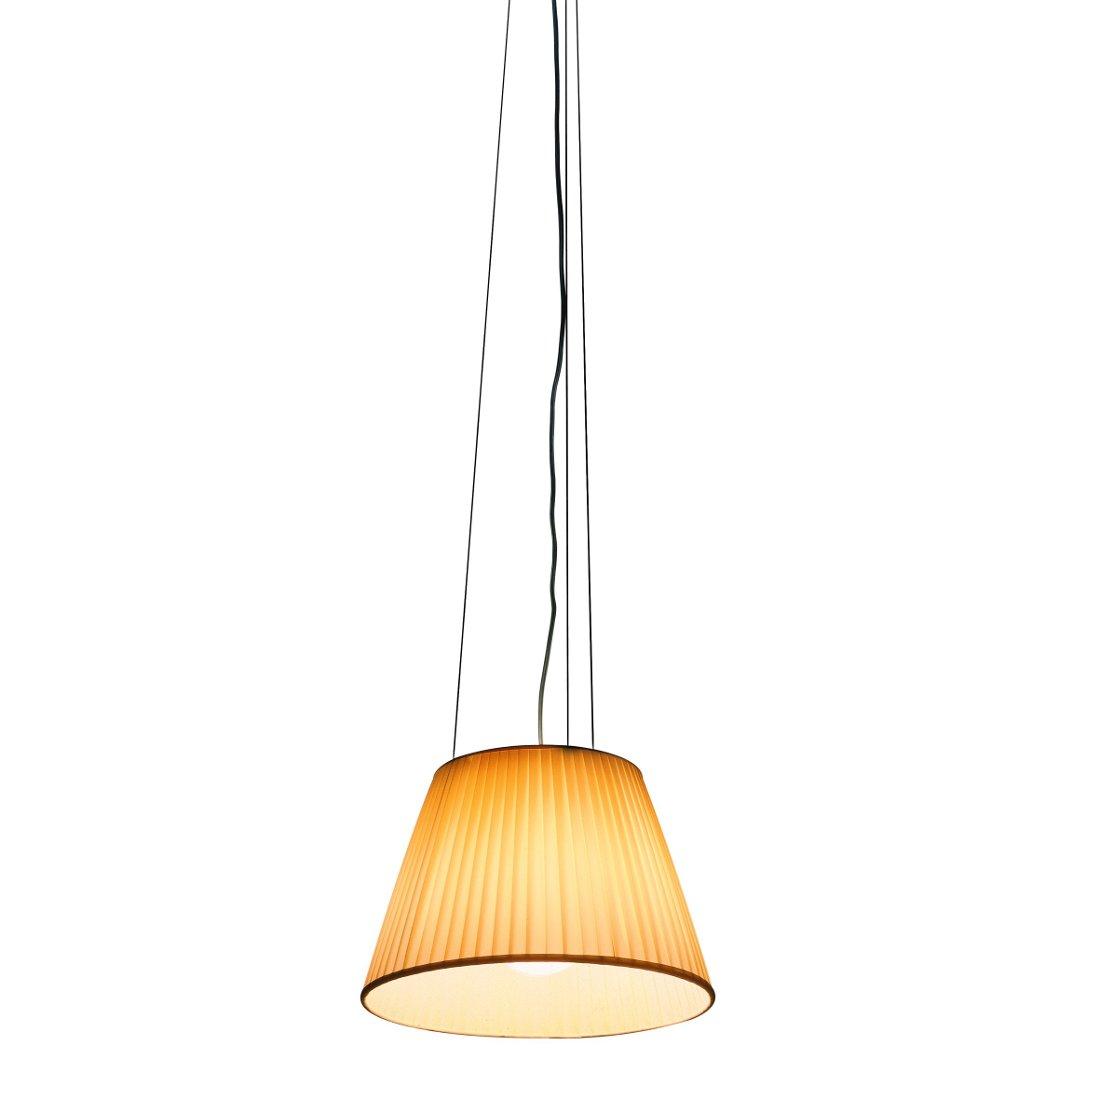 Flos romeo soft s1 l mpara colgante blanco f6105007 - Diseno lamparas colgantes ...